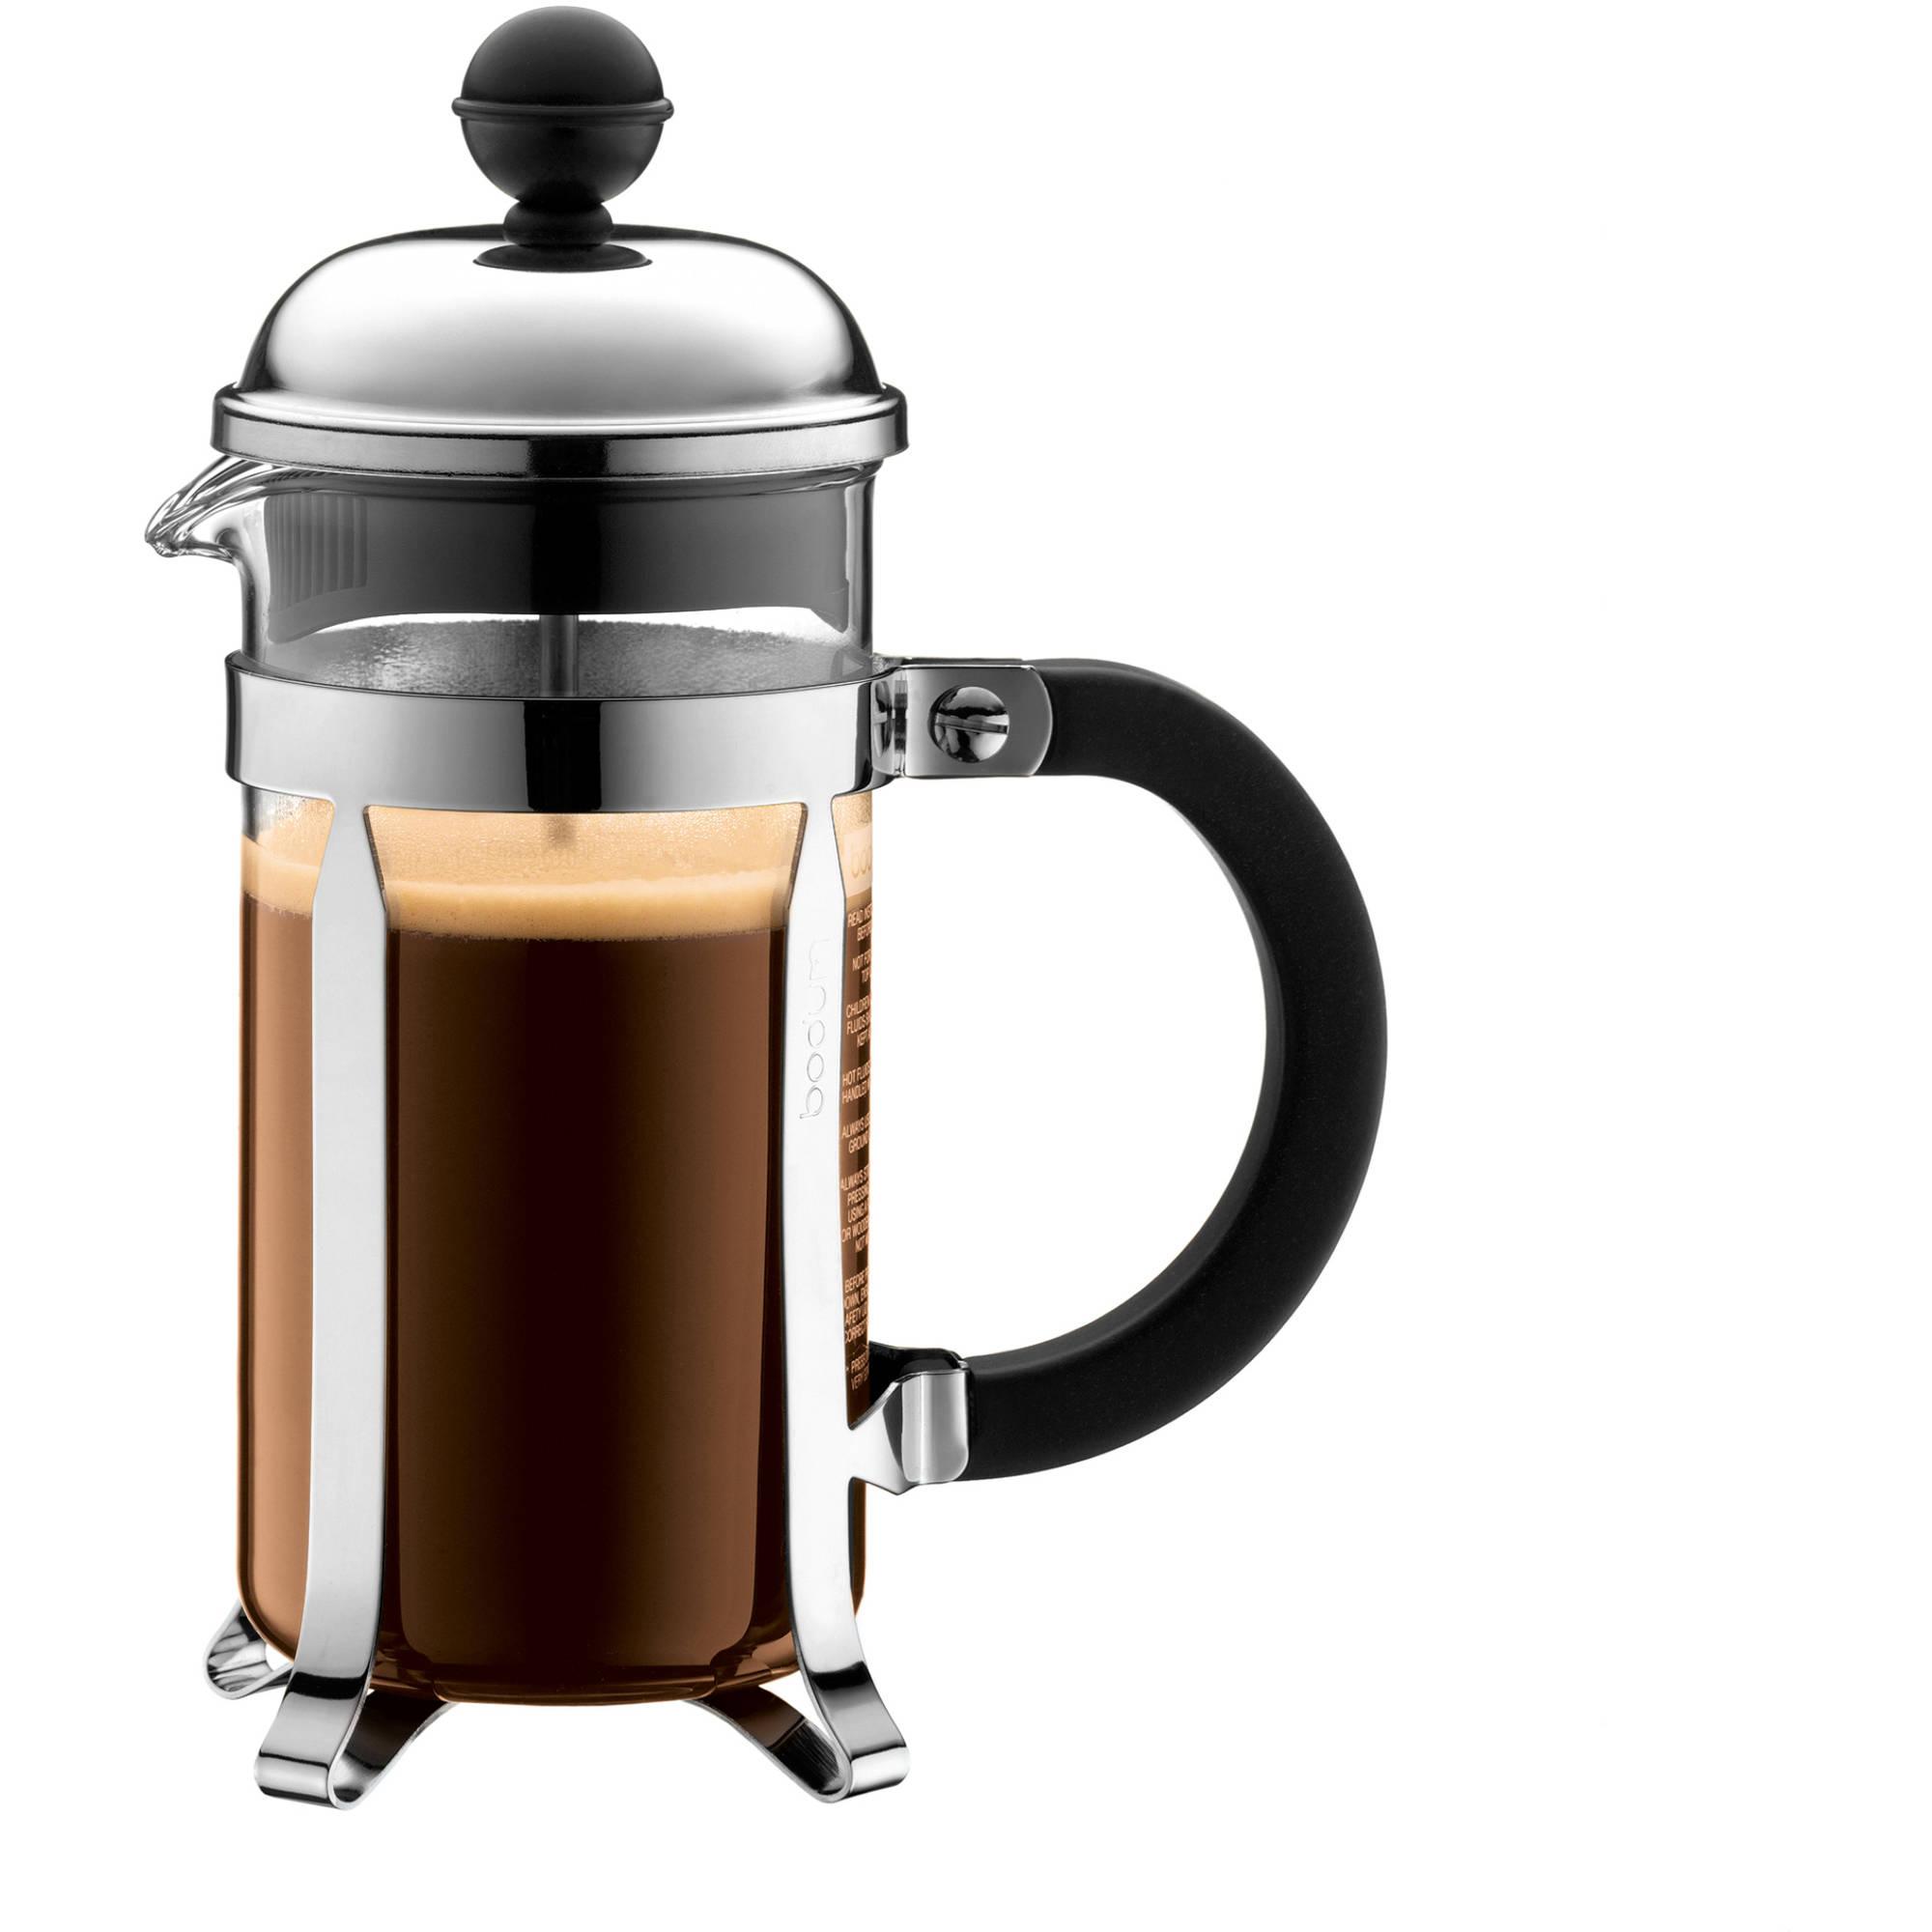 Bodum CHAMBORD French Press Coffee Maker, Glass, 0.35 L, 12 Oz, 3 Cup, Chrome